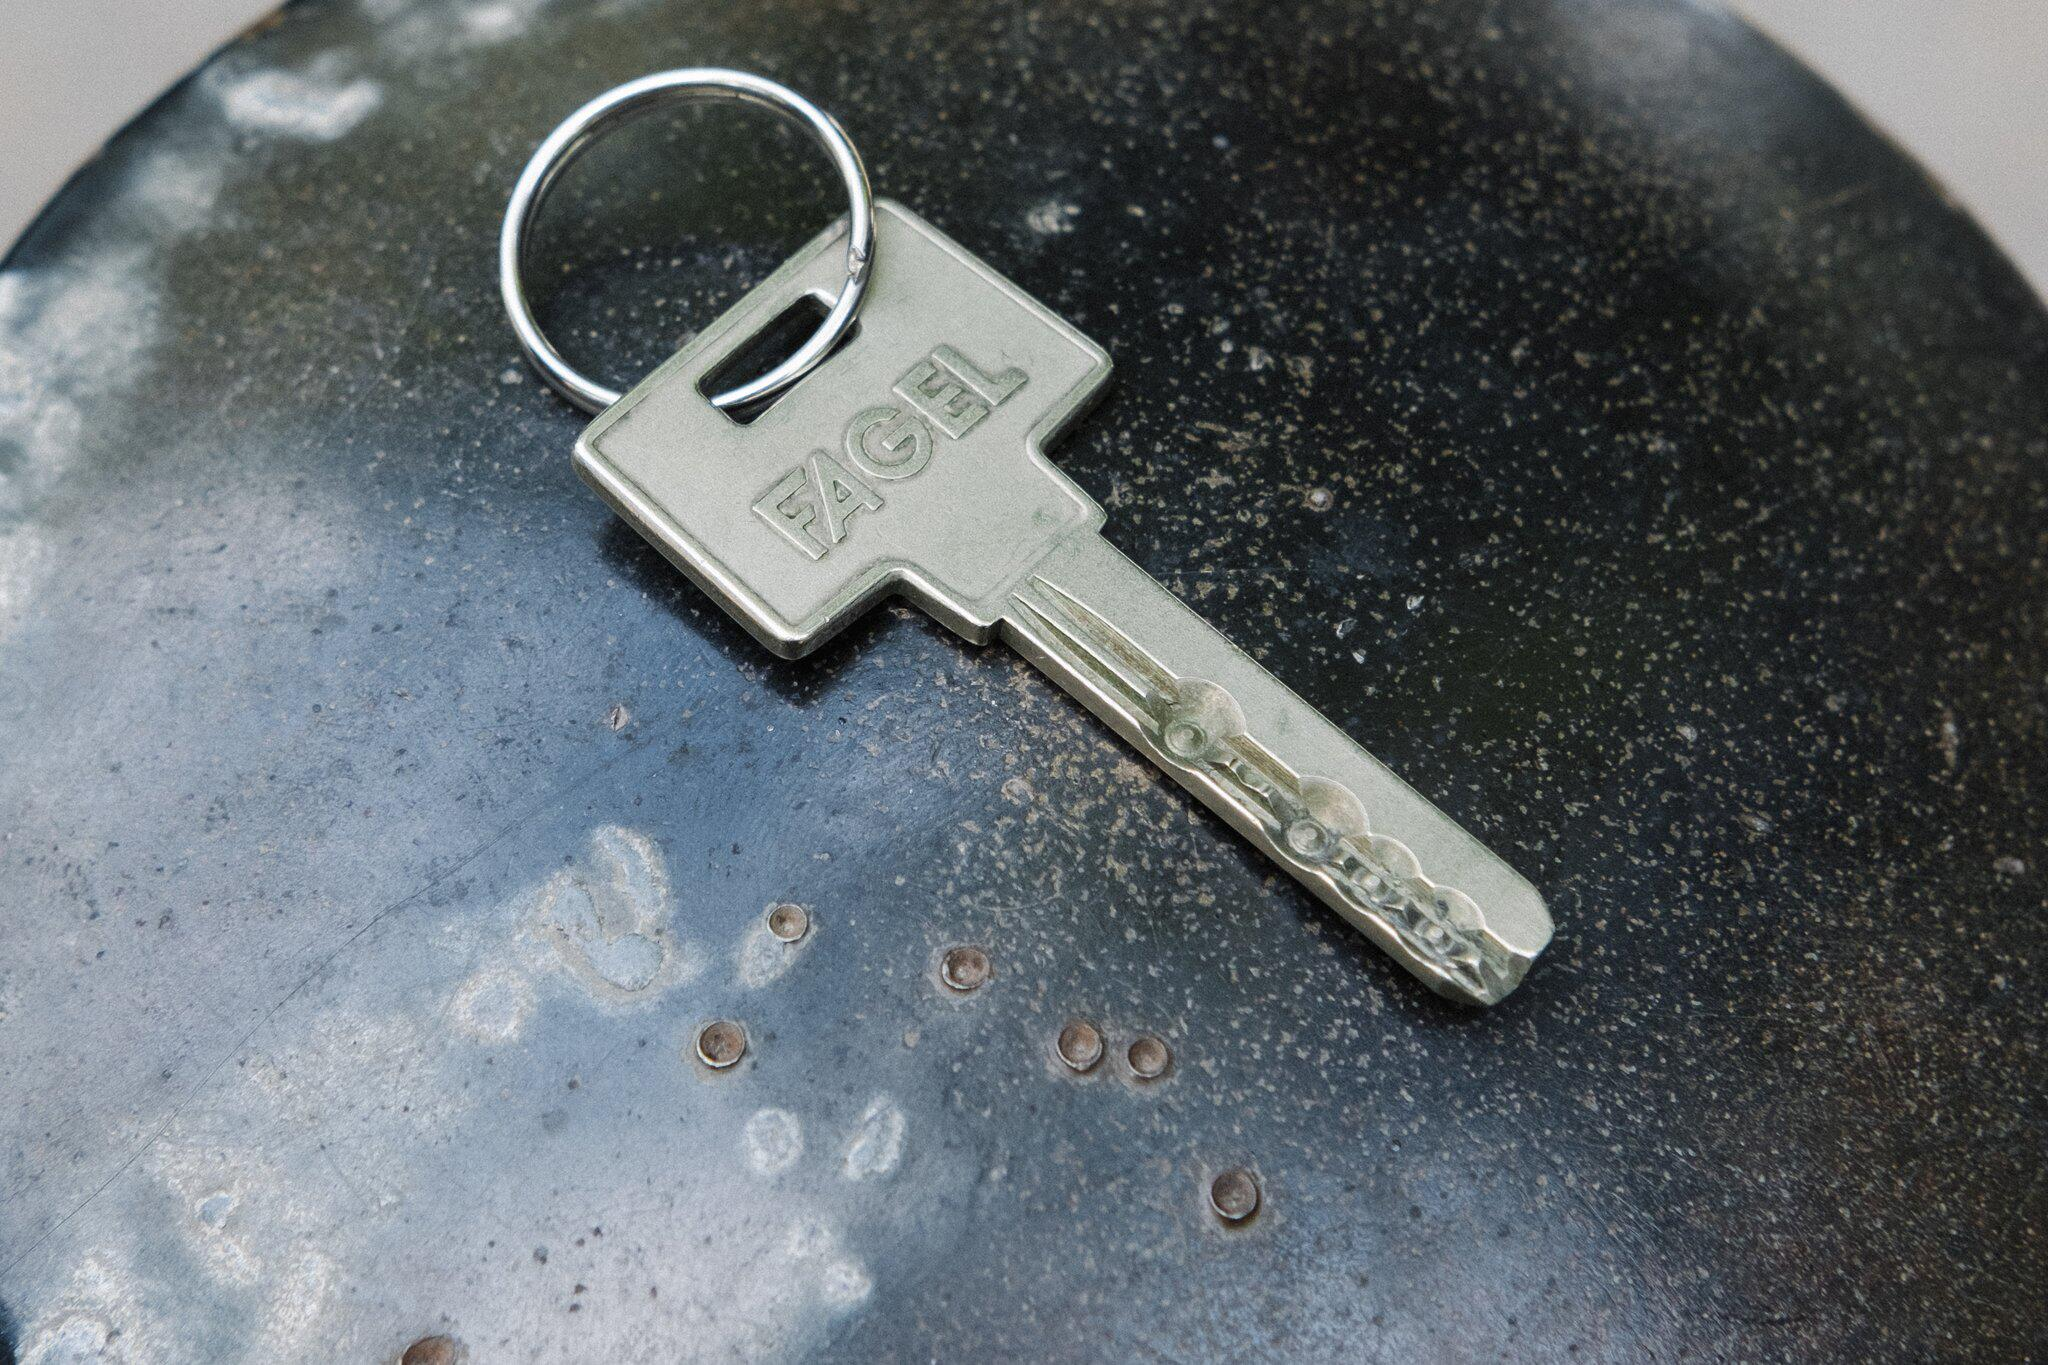 Bild zu Türschlüsseltest wegen unbekannten Jogger